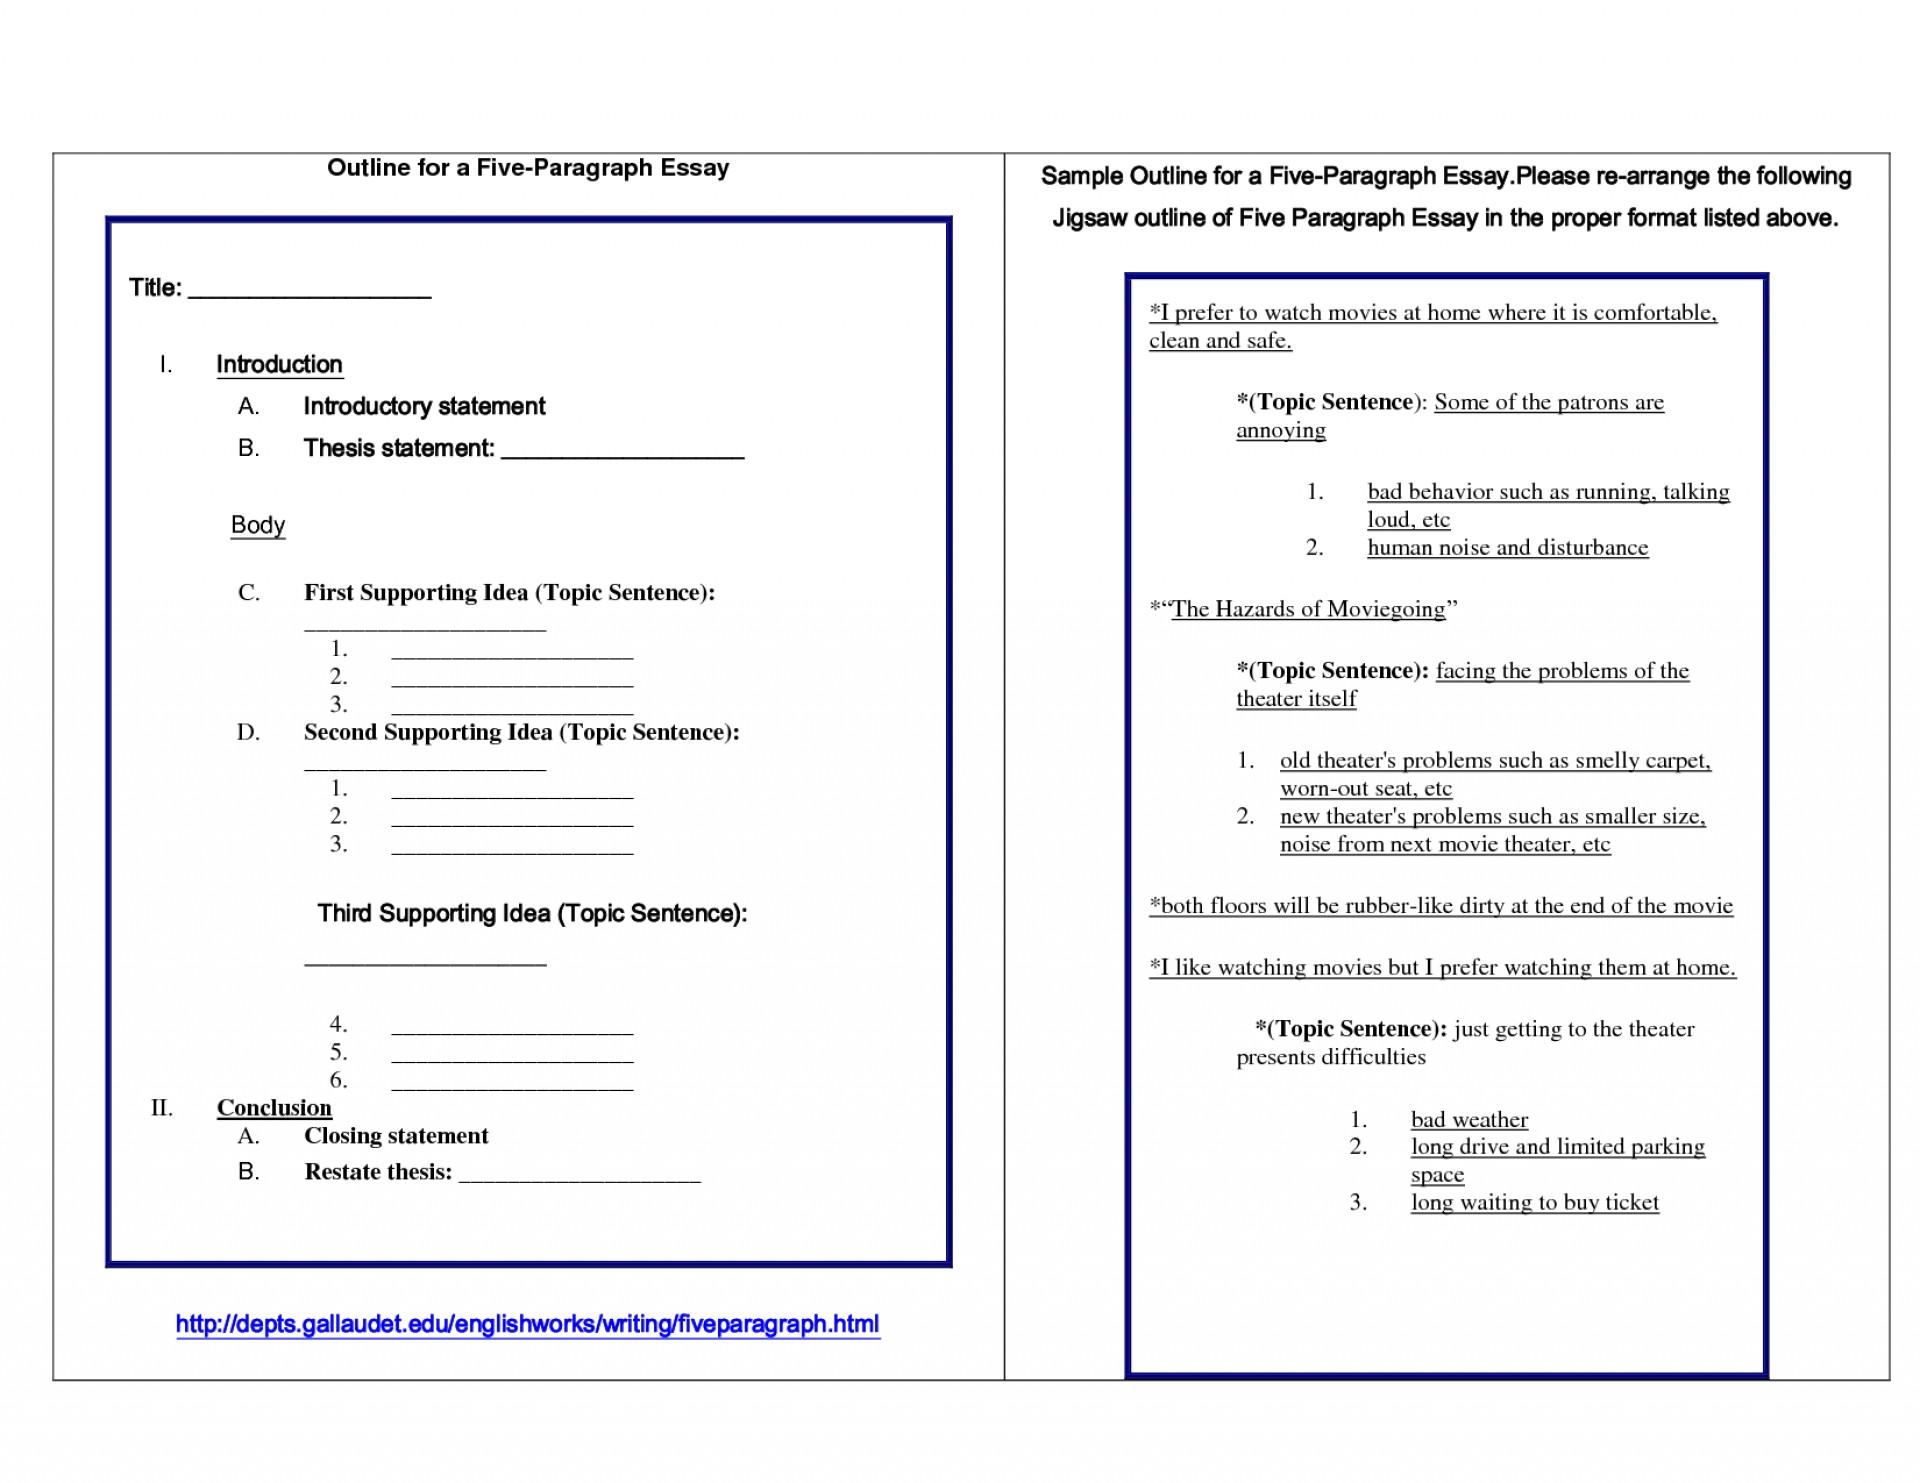 028 Essay Example Paragraph Topics Bunch Ideas Of Outline Persuasive Template Az Unique Best 5 For High School Middle 1920